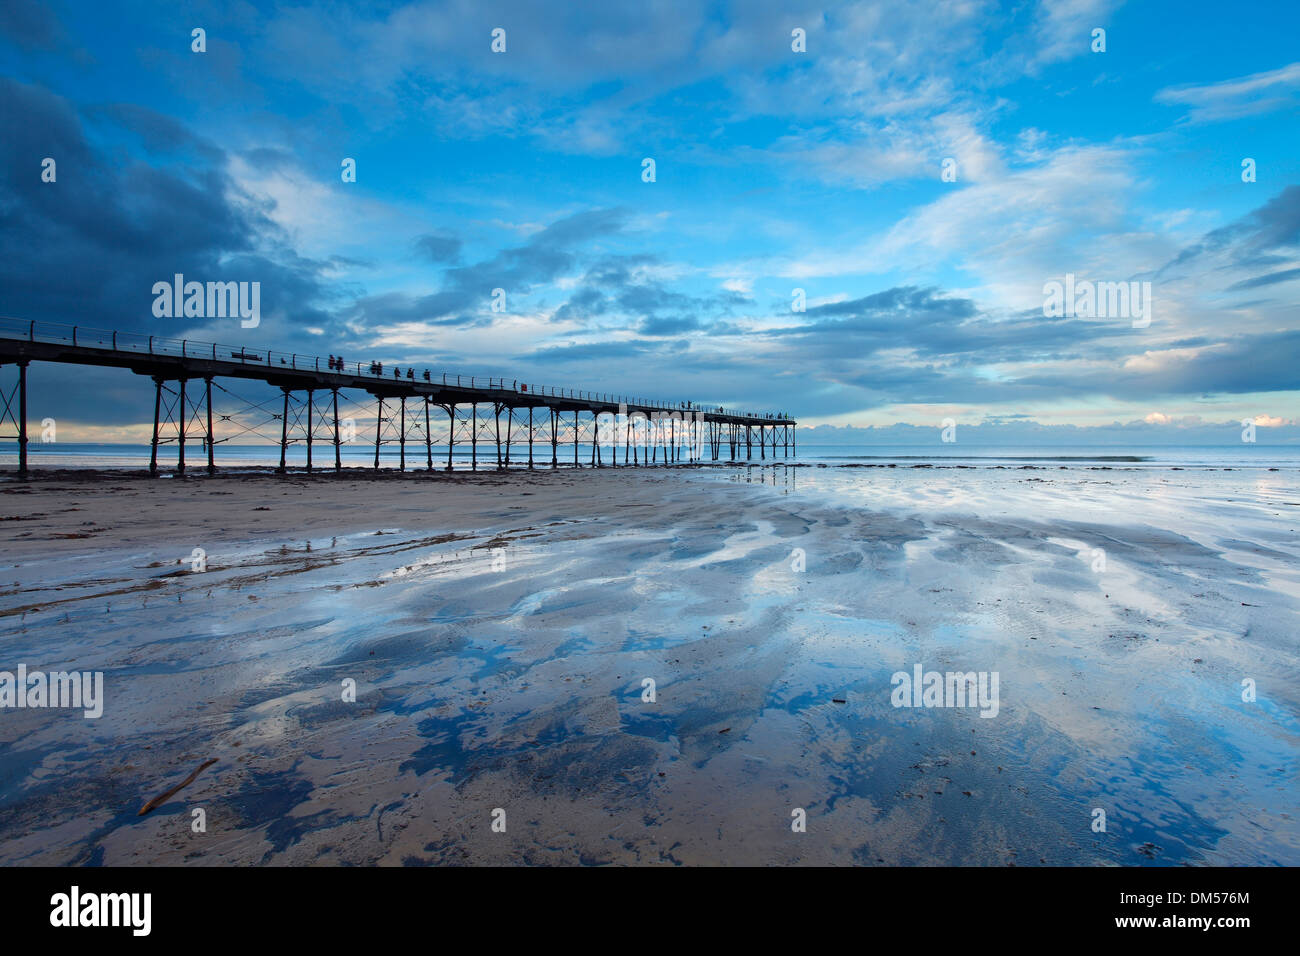 Pier at Saltburn, North Yorkshire - Stock Image